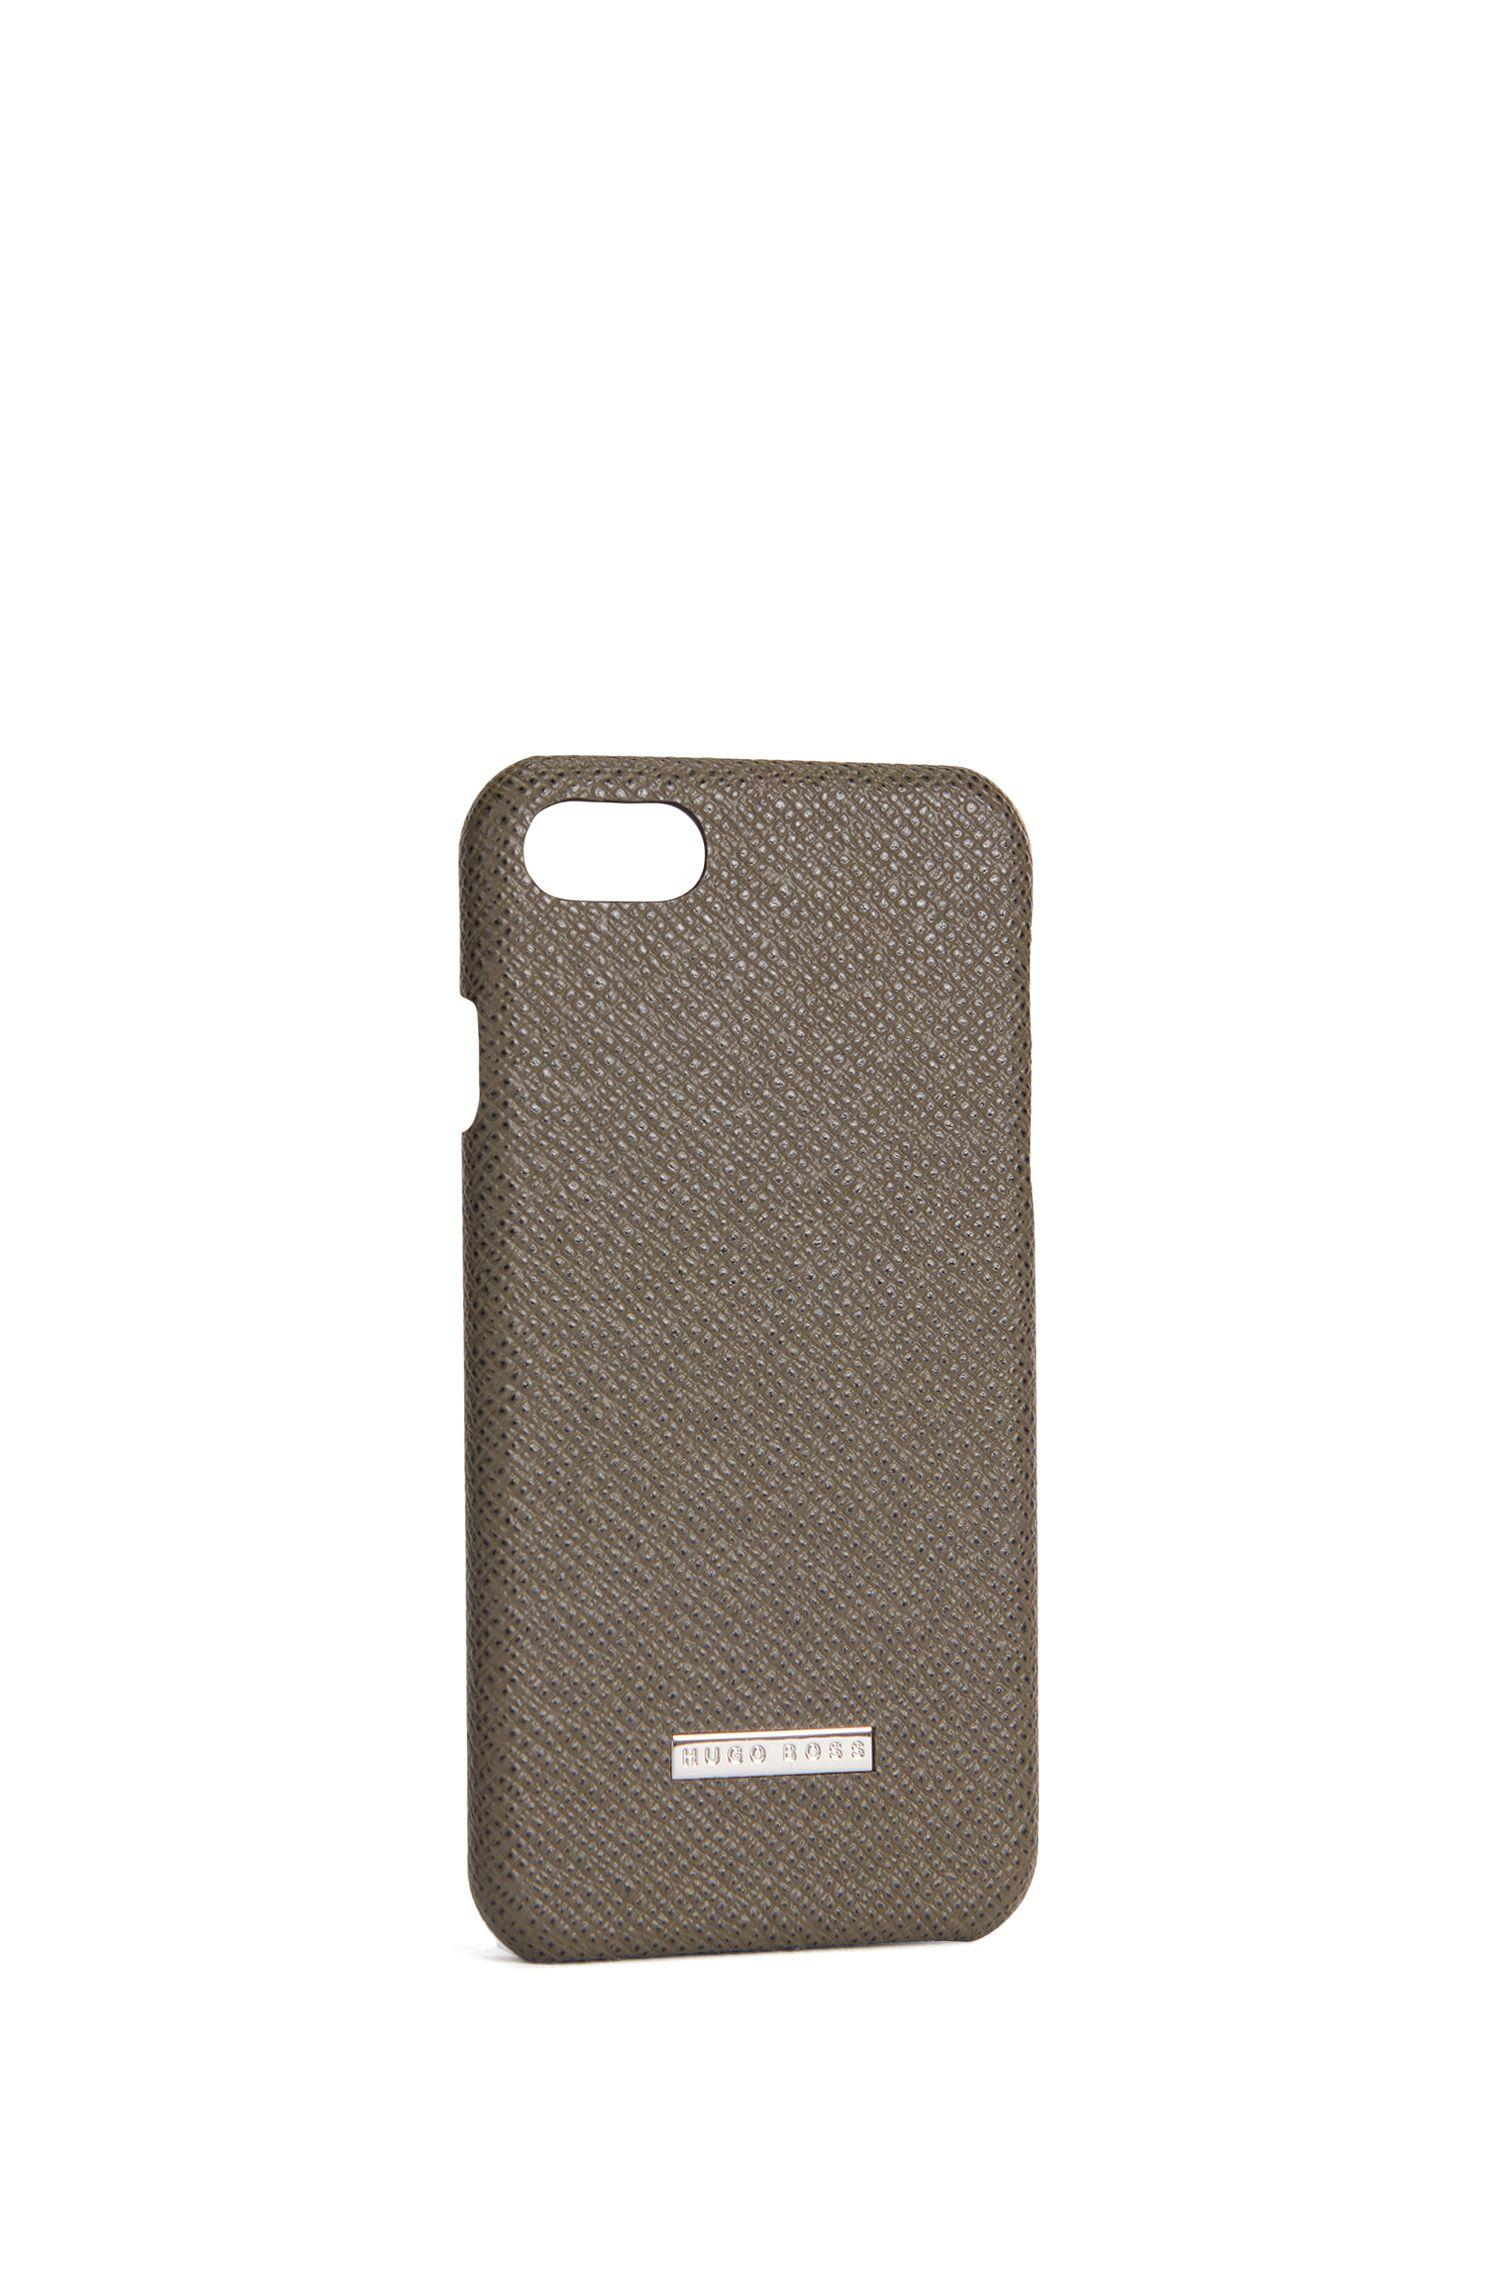 'Signature Phone 7' | Embossed leather iPhone 7 Case